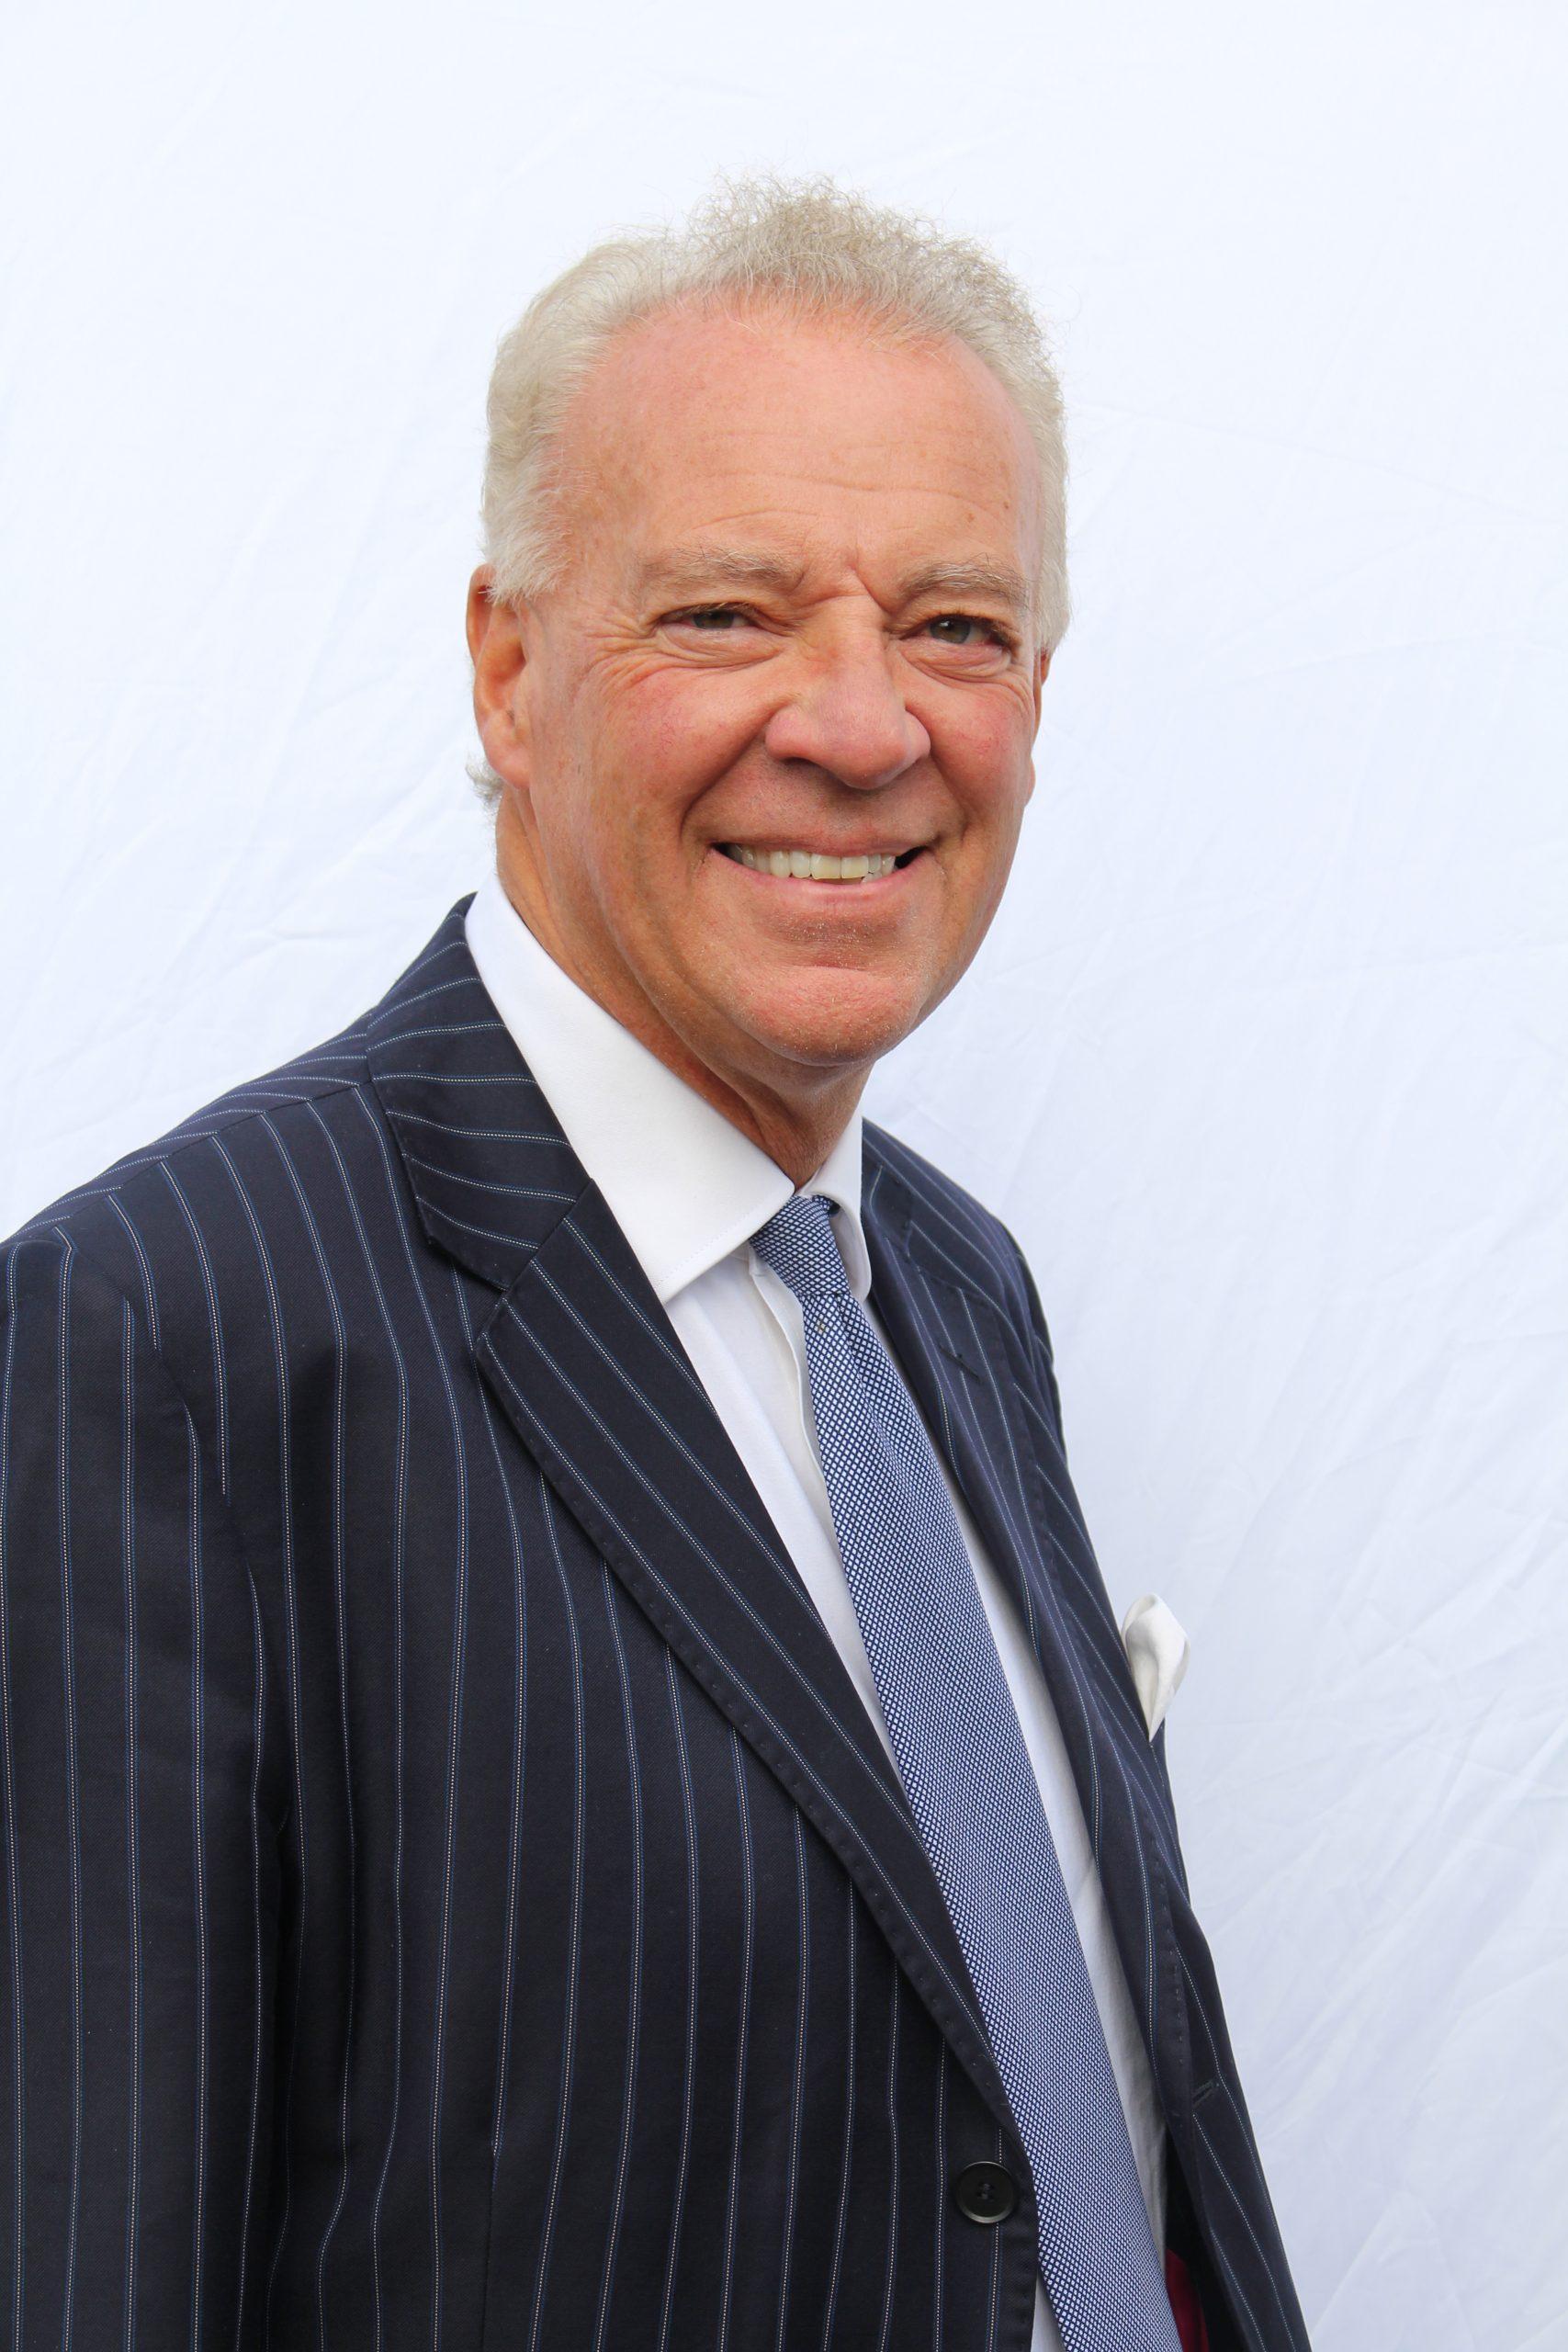 Leader of Rushcliffe Borough Council Cllr Simon Robinson scaled